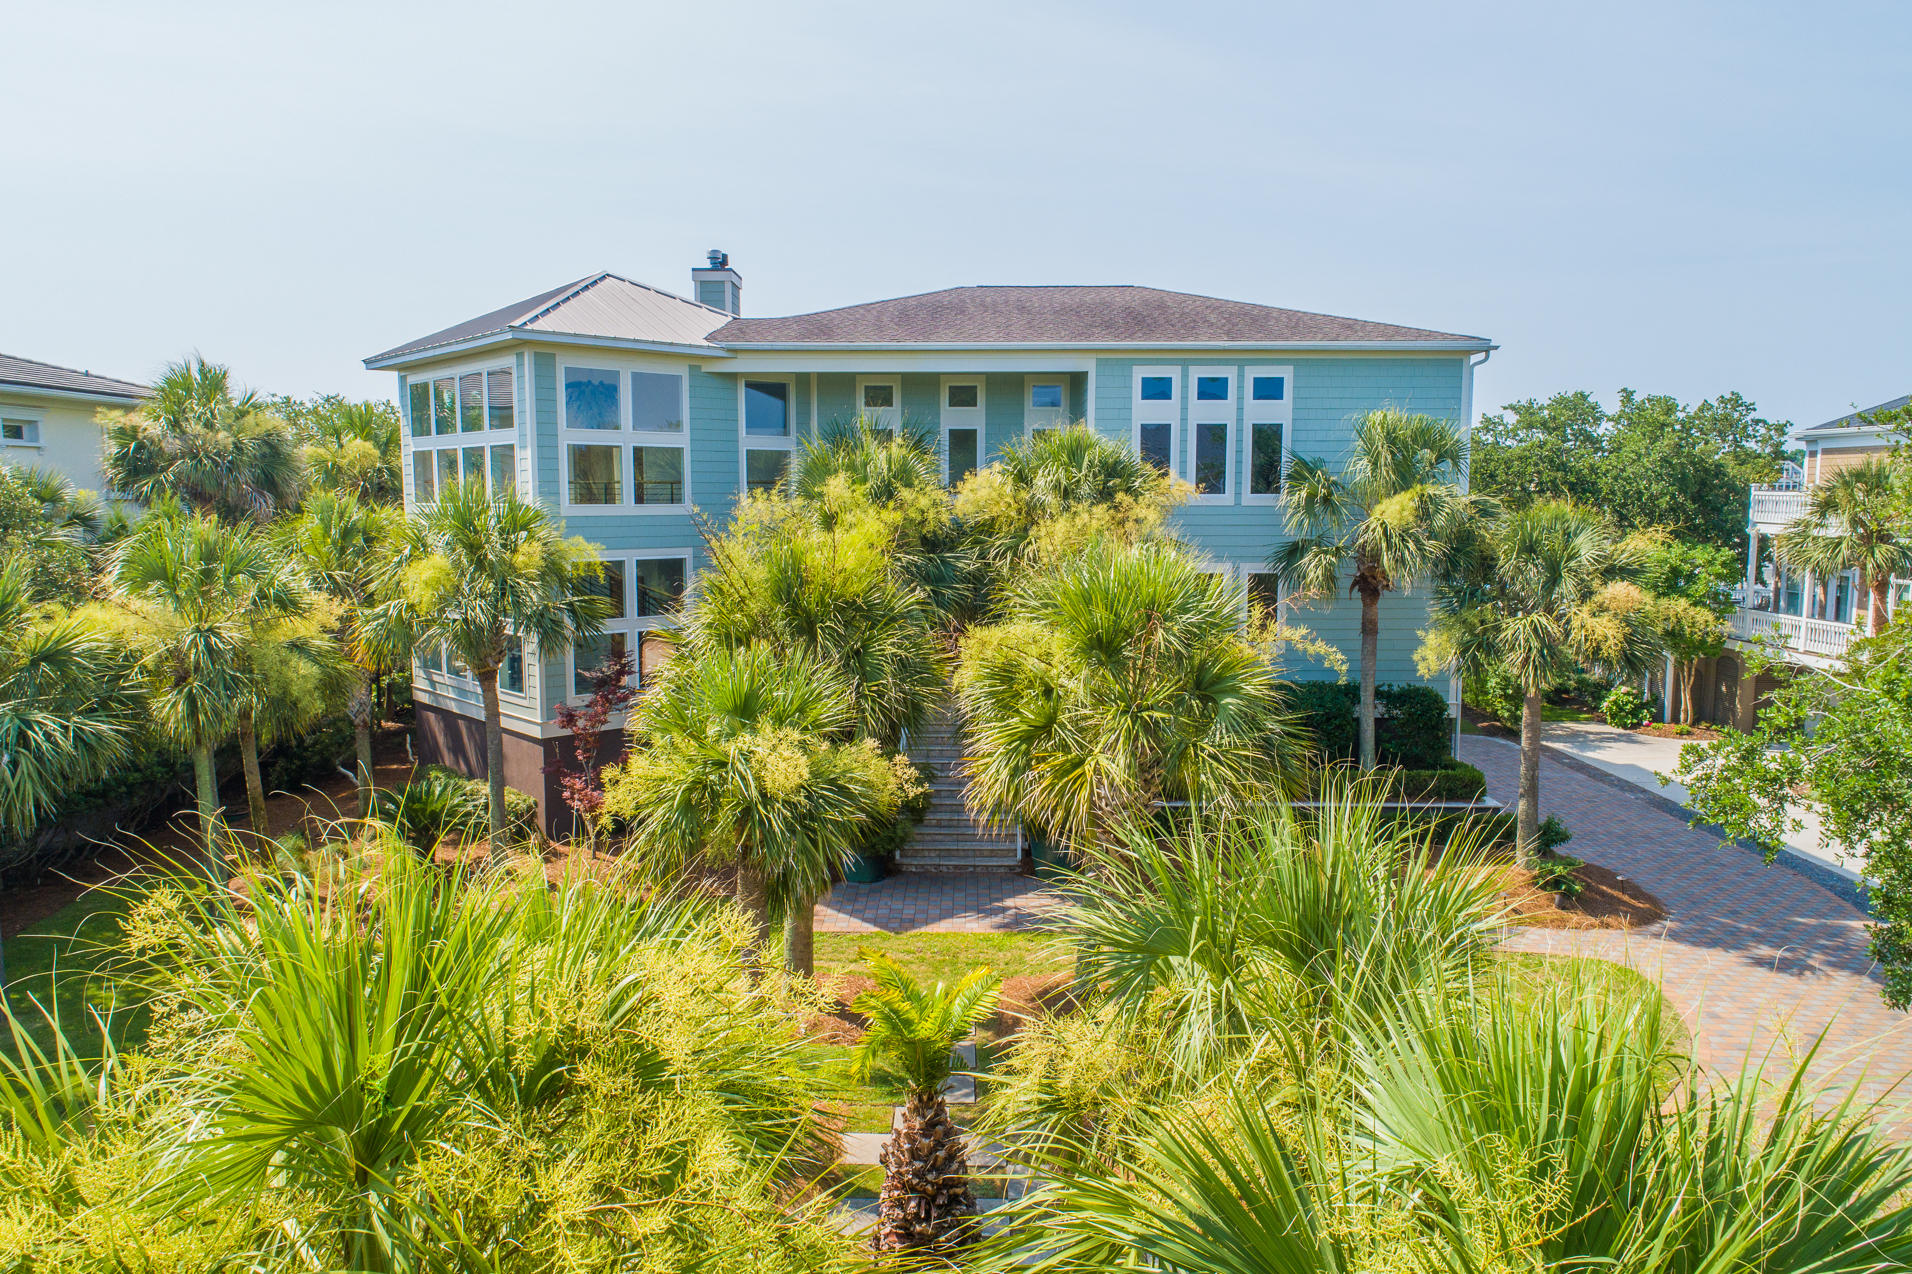 Wild Dunes Homes For Sale - 39 Waterway Island, Isle of Palms, SC - 35